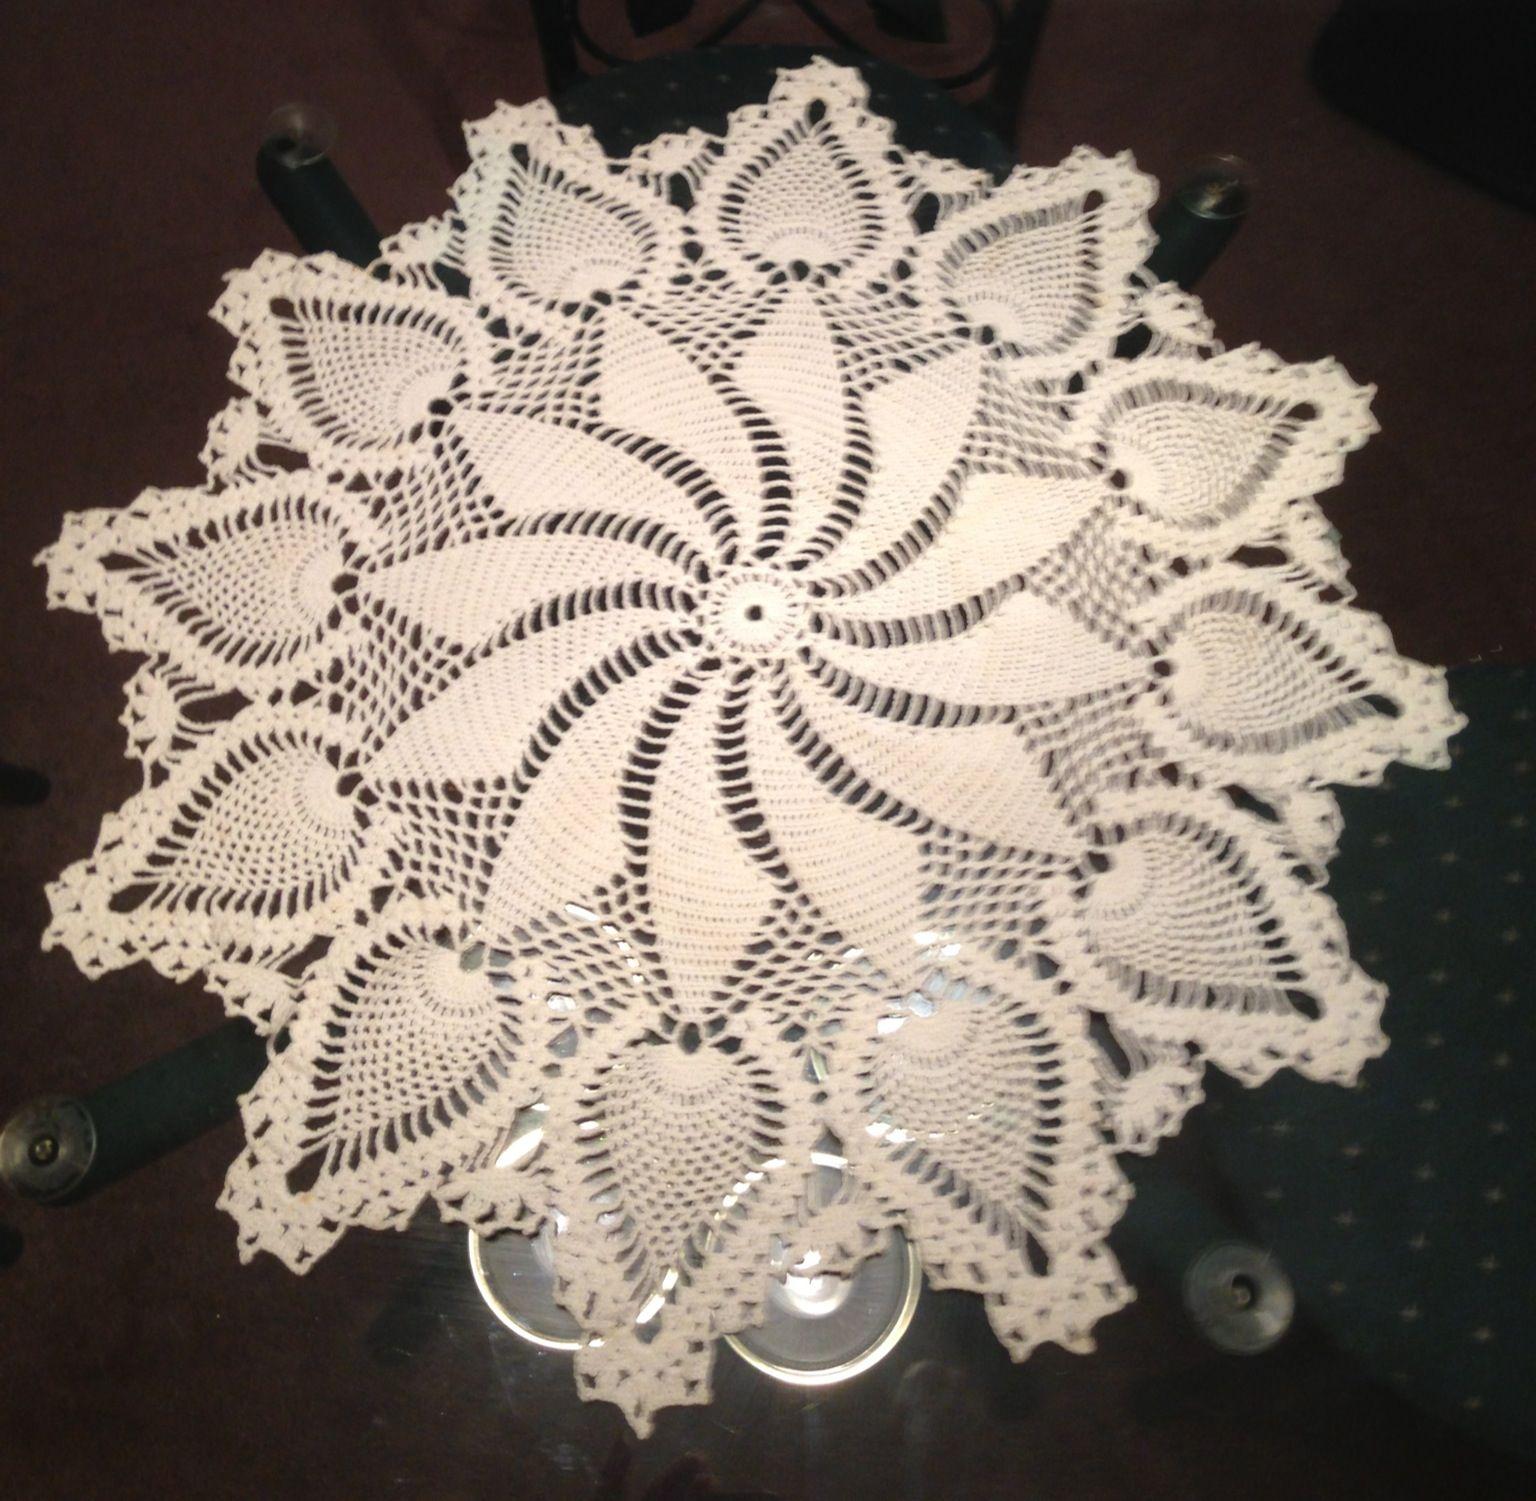 Pineapple Crochet Doily Diagram Star Delta Wiring Control Circuit Pinwheel And Doilies Pinterest